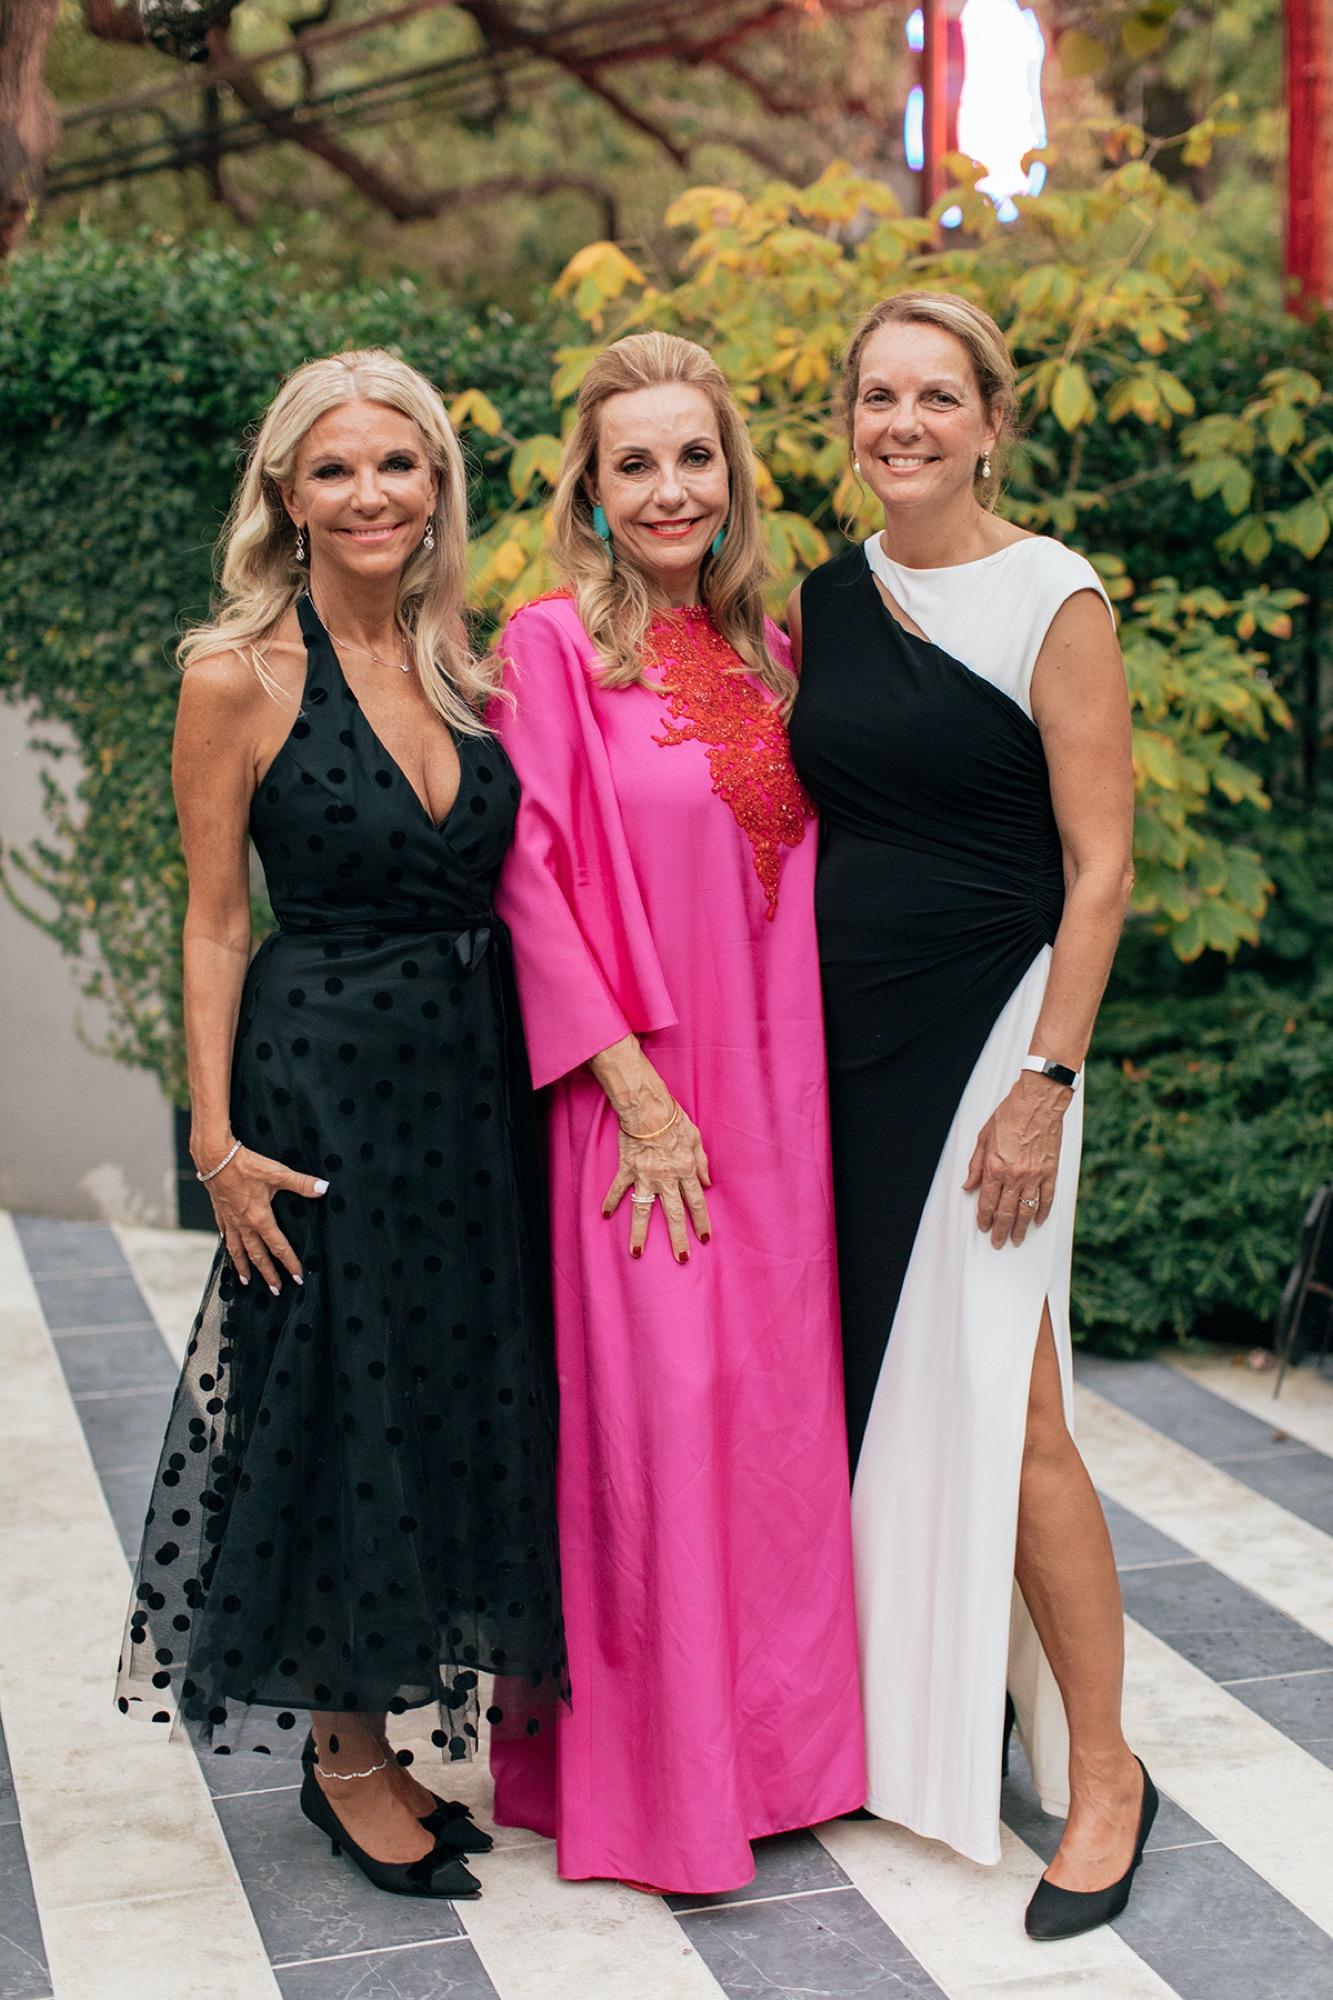 Amanda Black, Denise Hyde, and Megan Hoskins